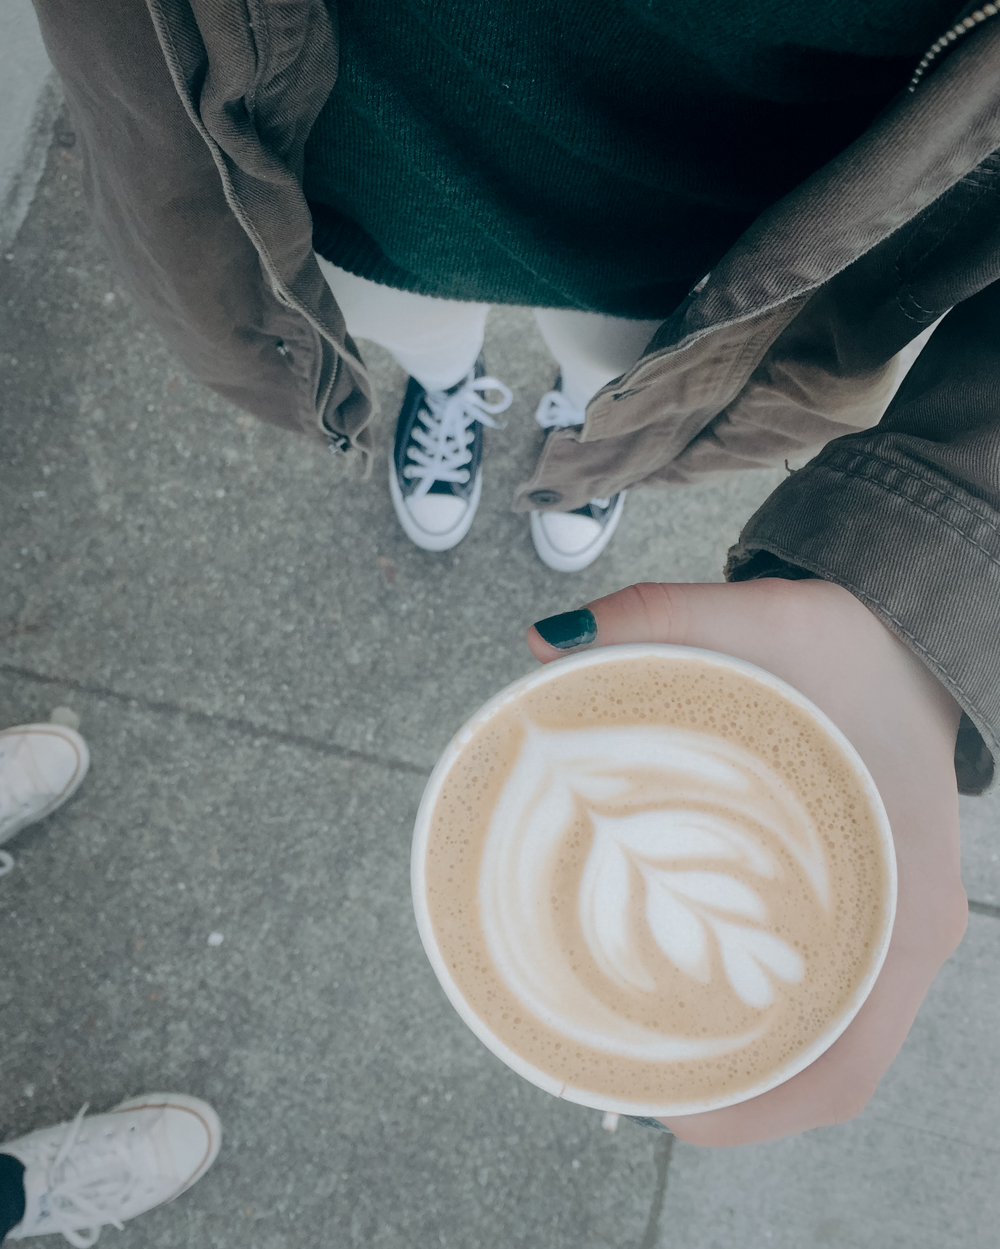 Latte art from Flywheel Coffee Roasters in the Haight-Ashbury neighborhood of San Francisco || 7 THINGS TO DO IN HAIGHT-ASHBURY, SAN FRANCISCO || Tinted Green